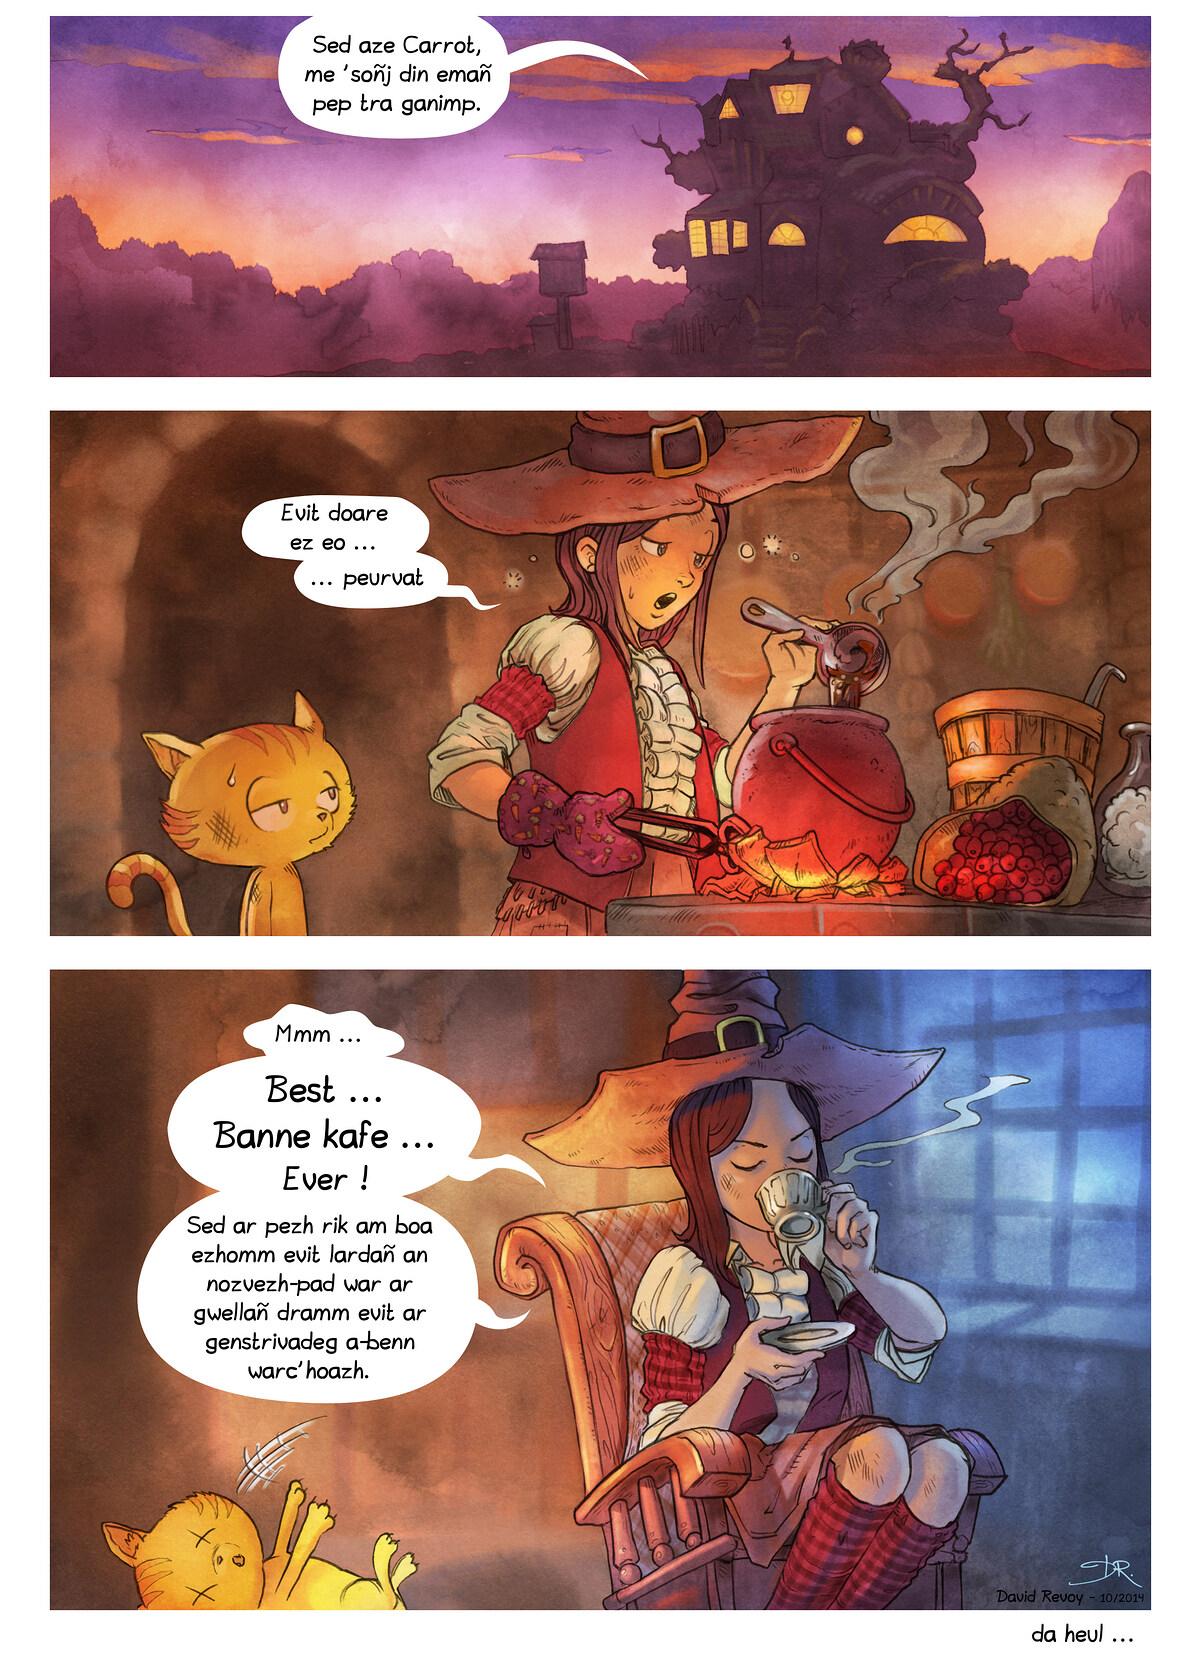 A webcomic page of Pepper&Carrot, rann 3 [br], pajenn 7